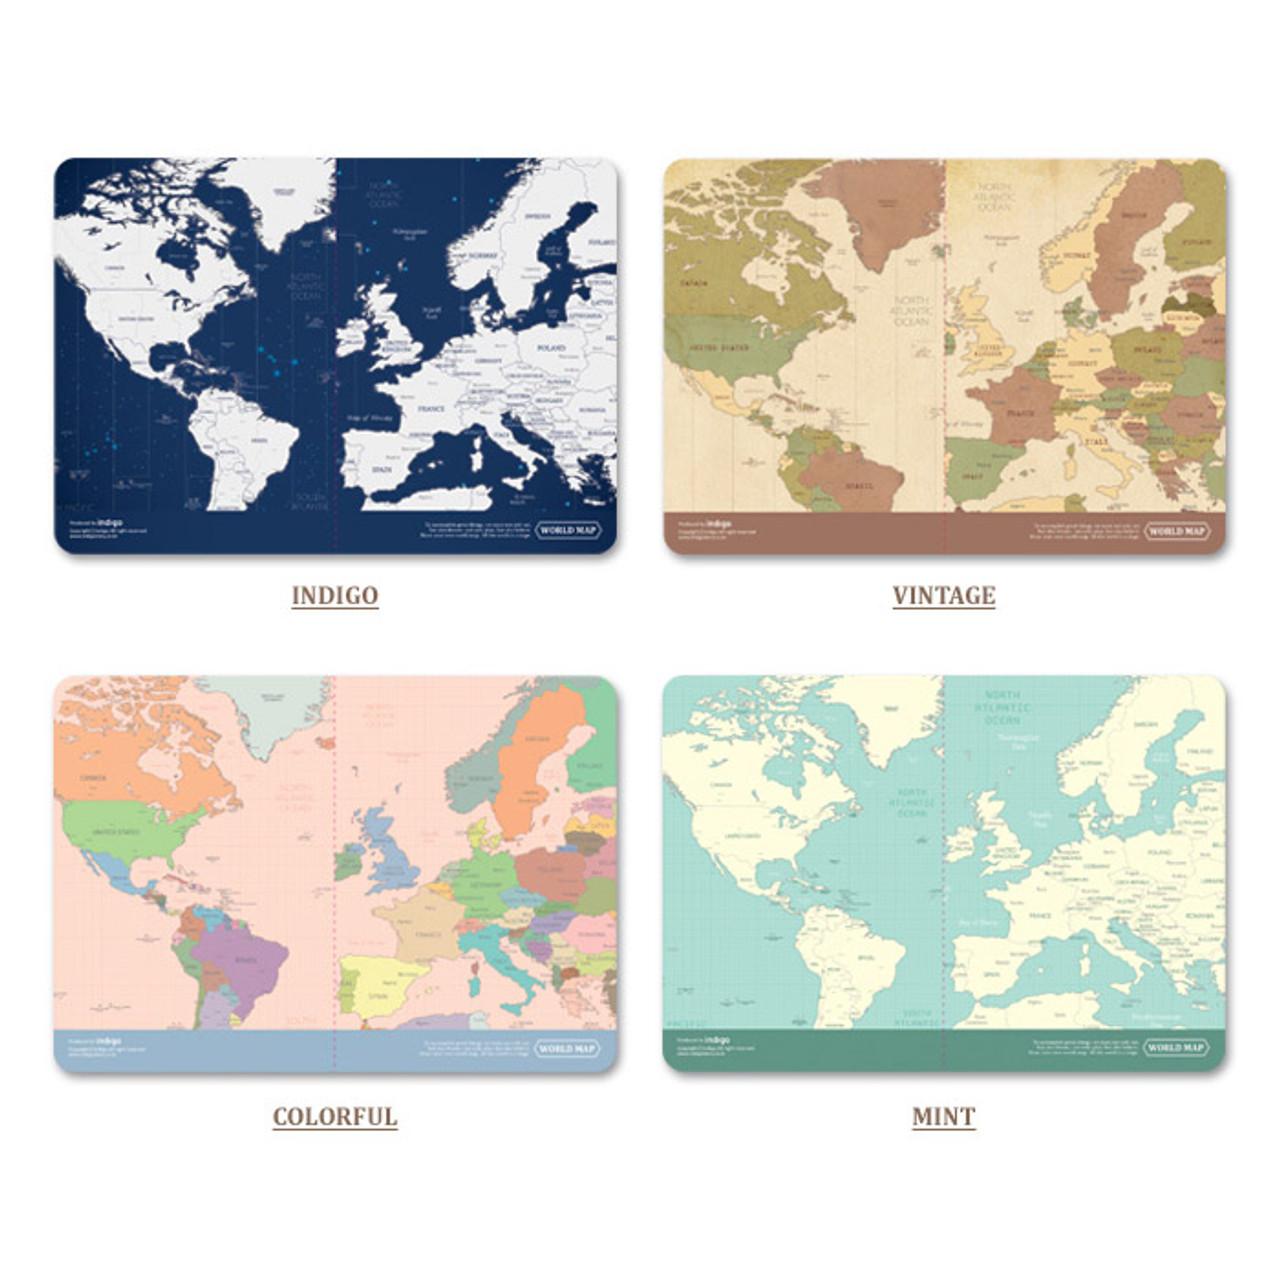 Indigo world map passport cover case fallindesign colors of world map passport cover case gumiabroncs Choice Image